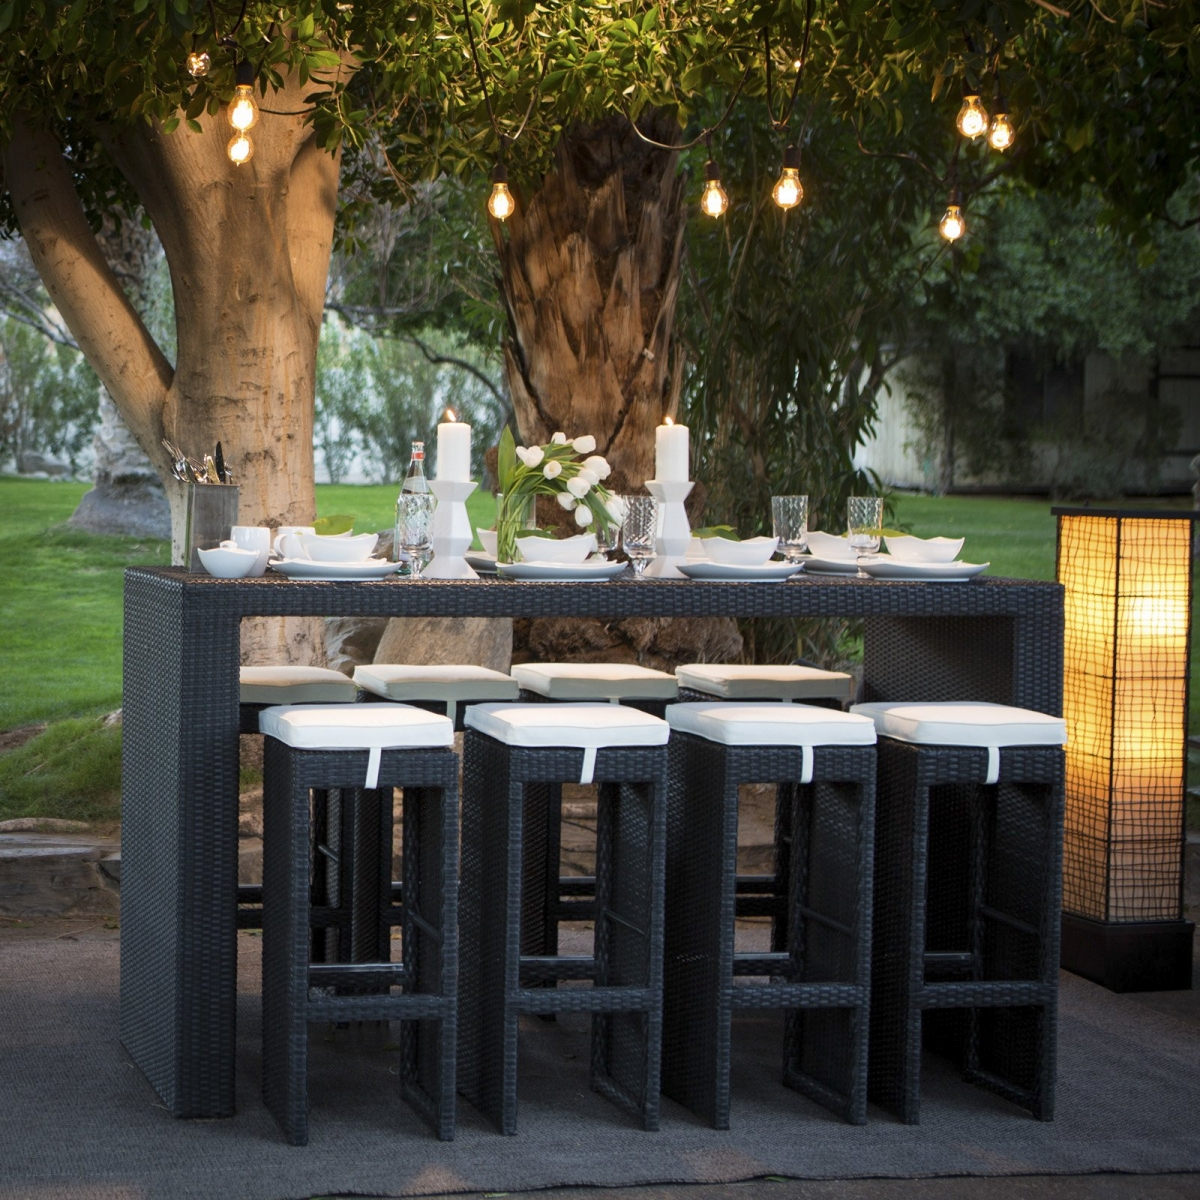 Belham_Living_Matica_All-Weather_Wicker_Bar_Height_Patio_Dining_Set - Seats 8